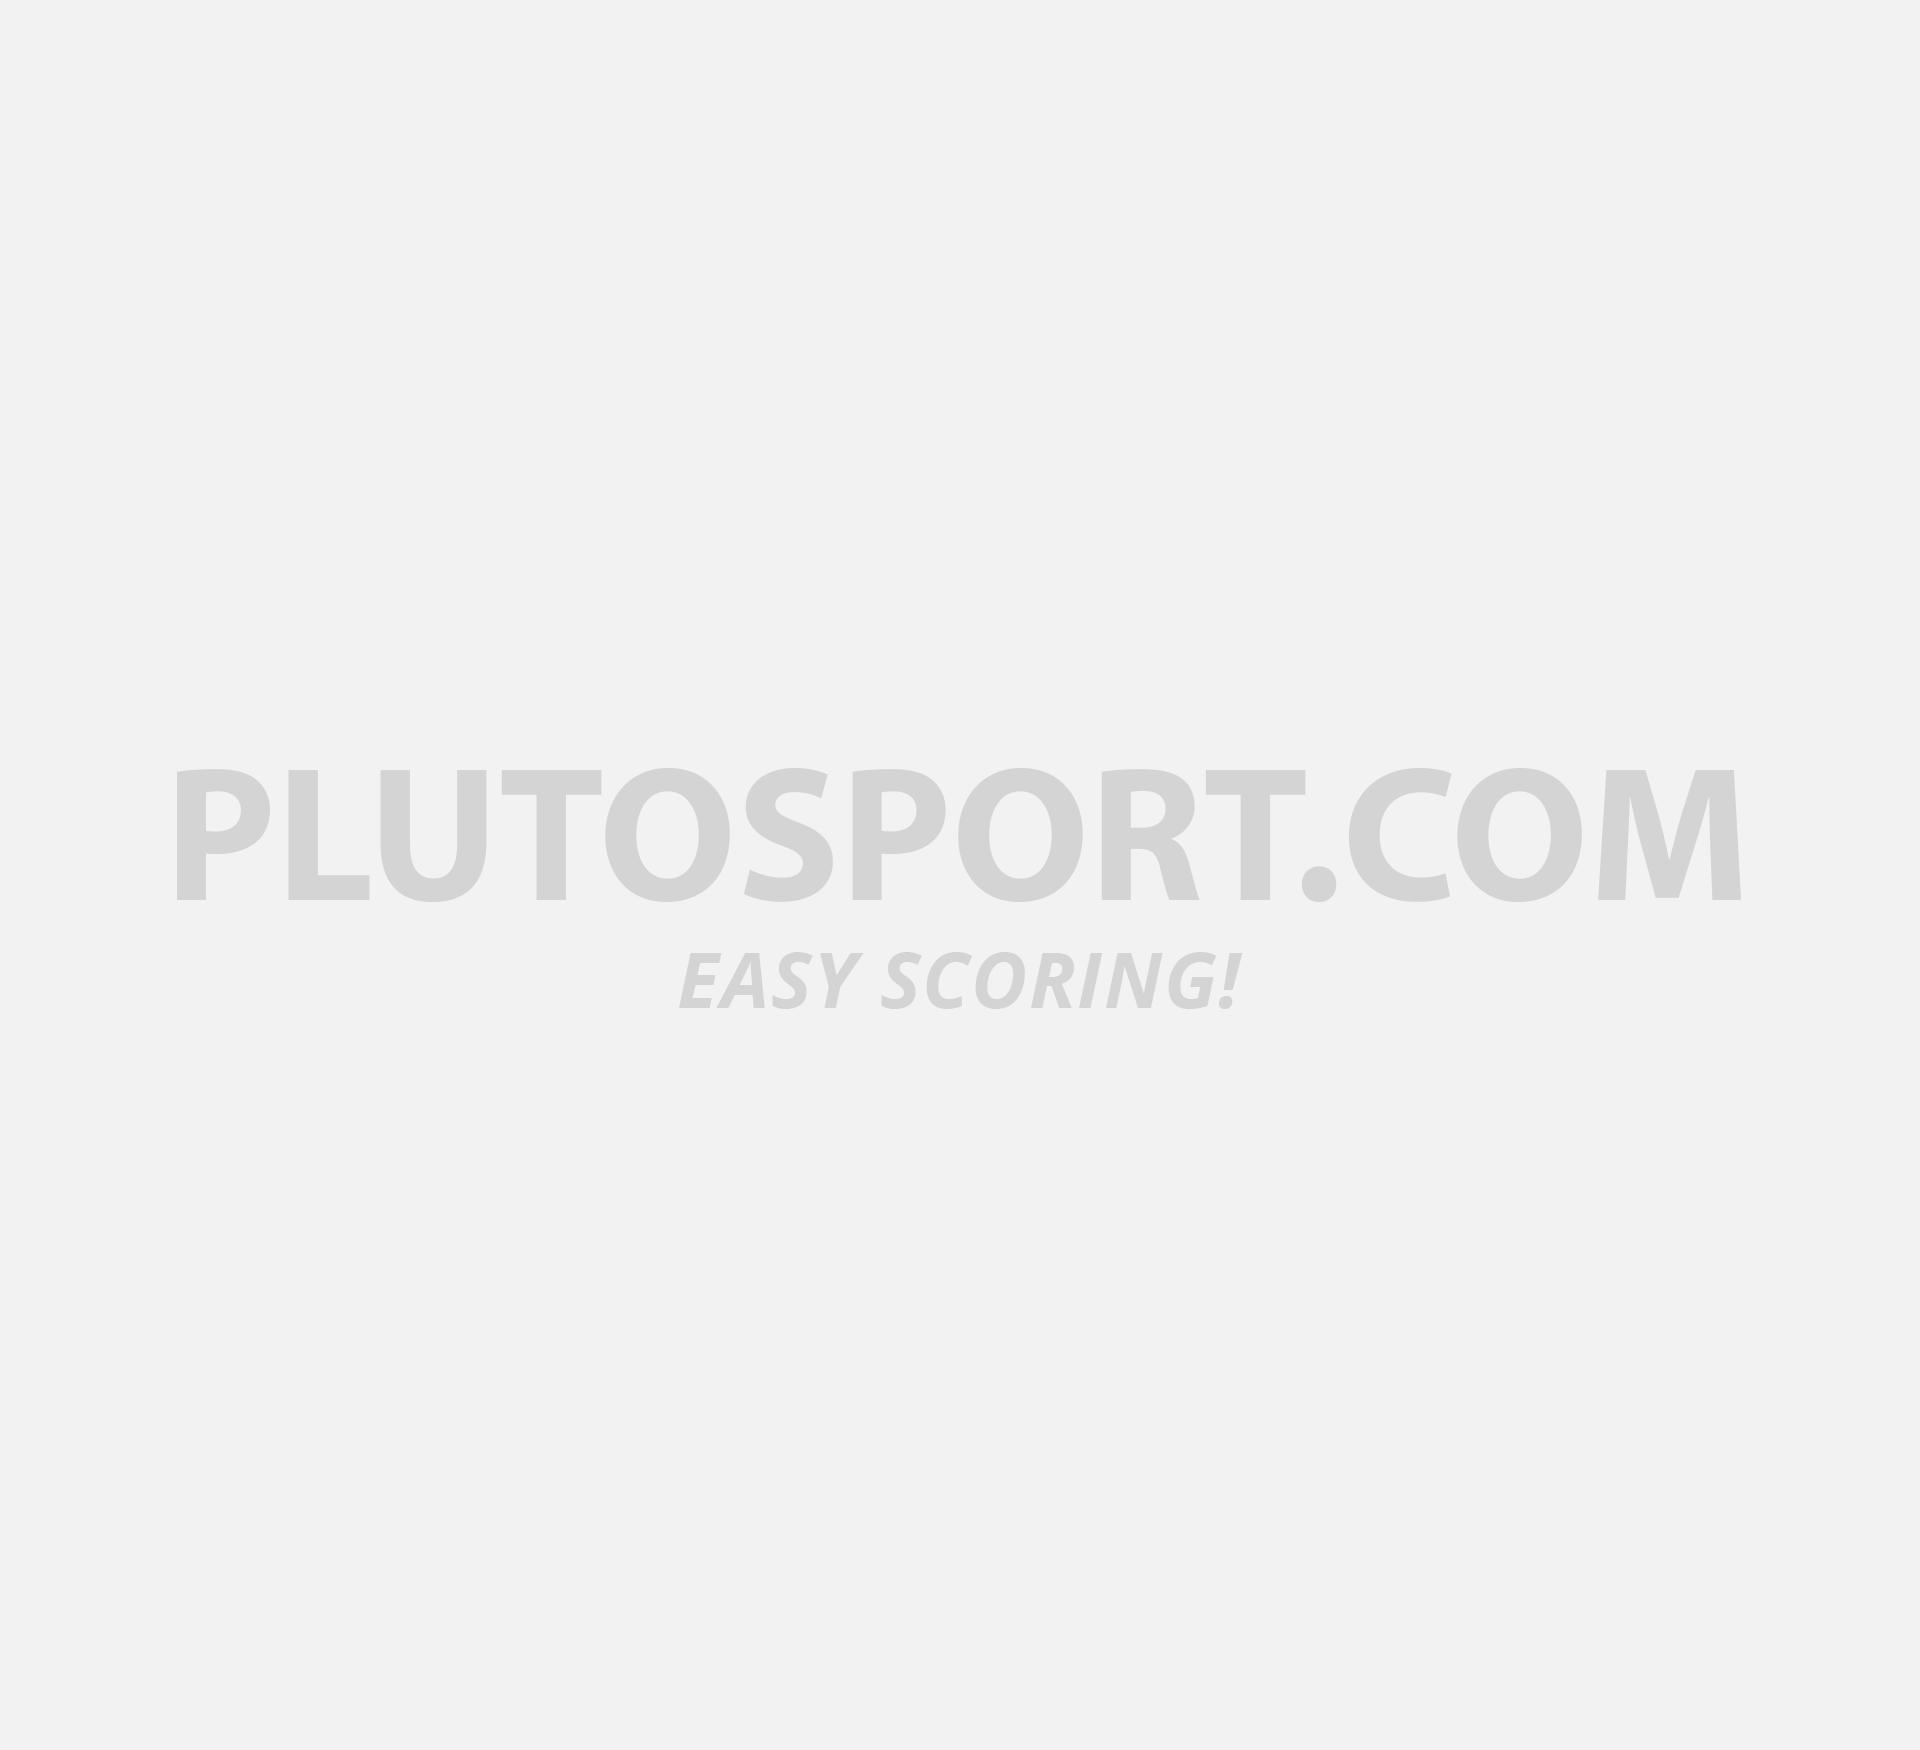 e6068d6cdb Roxy Quinn Snowboard Jacket - Winter jackets - Jackets - Clothing -  Lifestyle - Sports | Plutosport